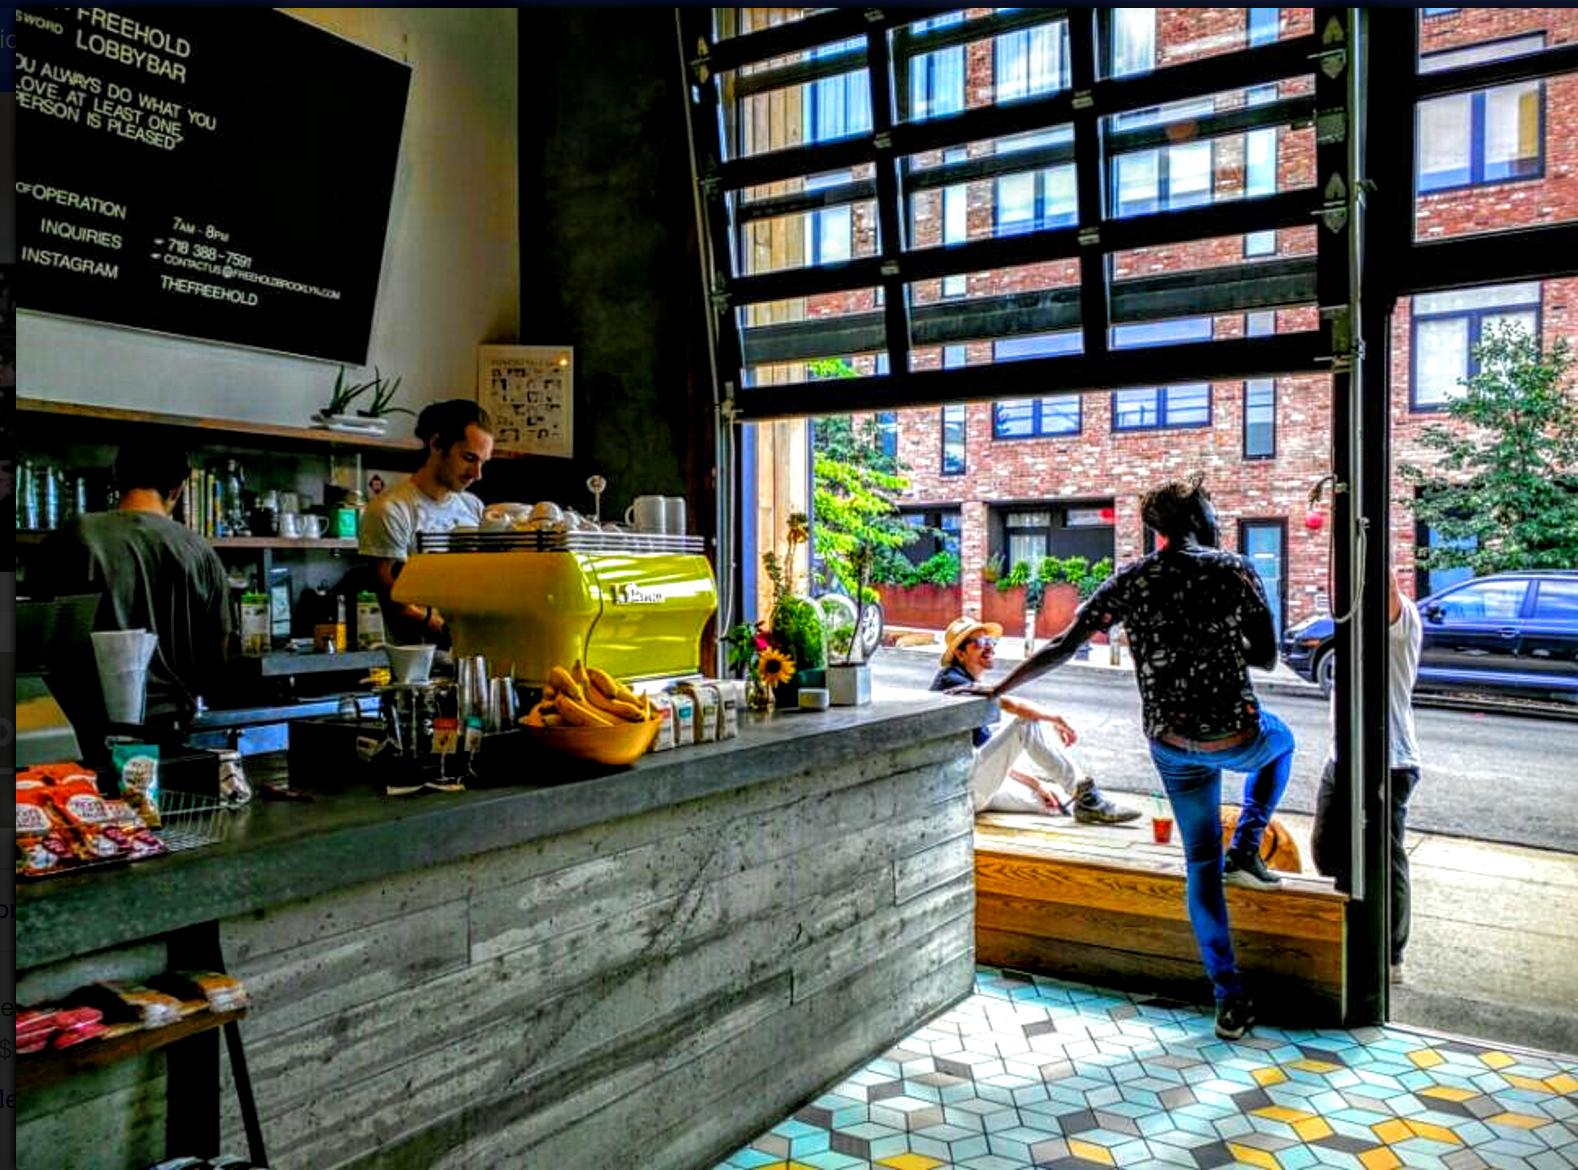 Glass_Garage_Door_Brooklyn_NY.png